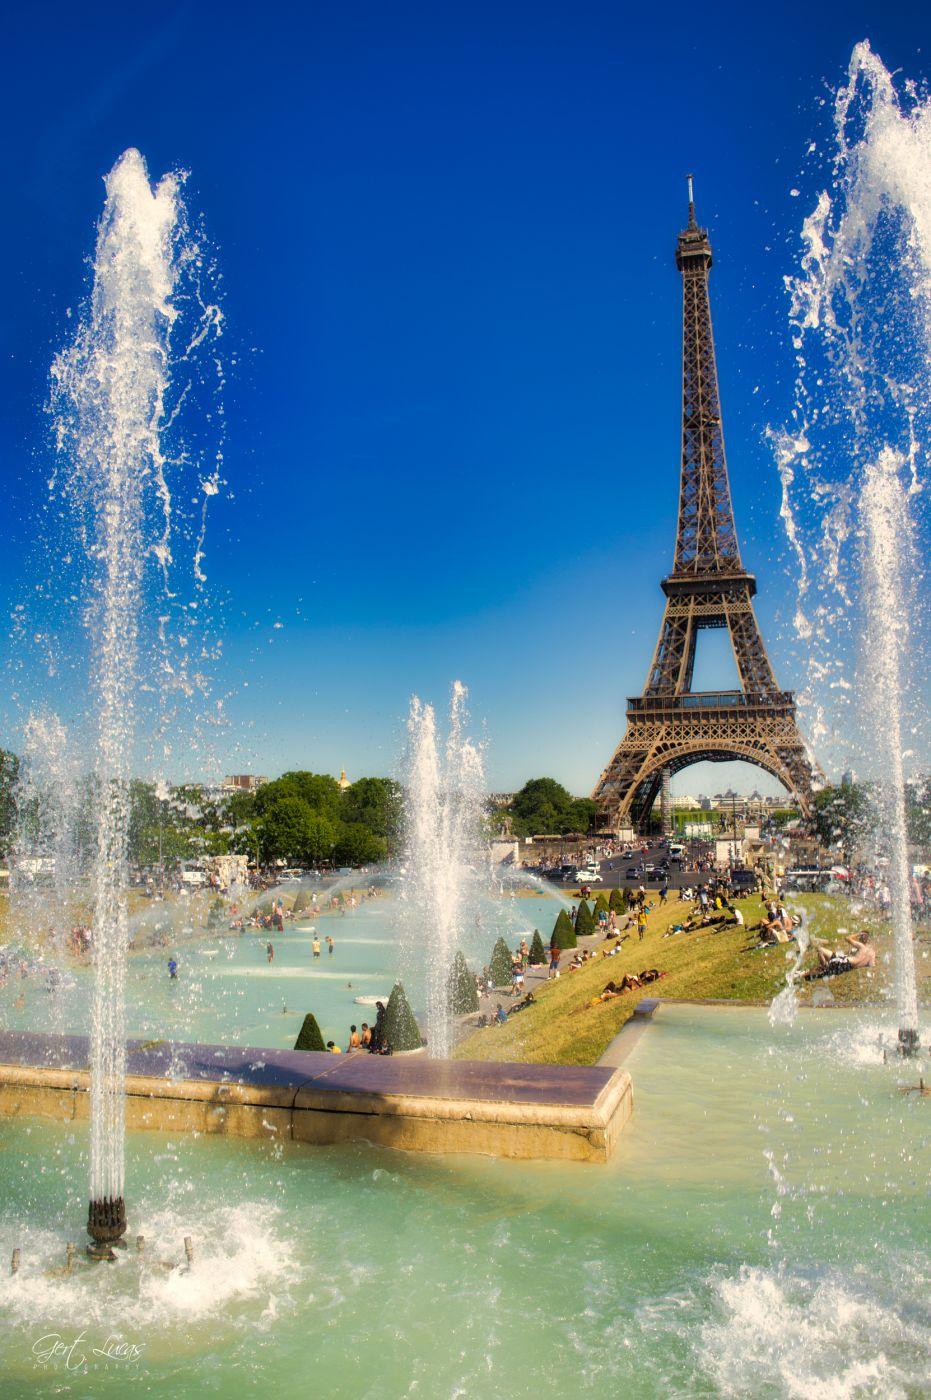 Trocadero Gardens, France